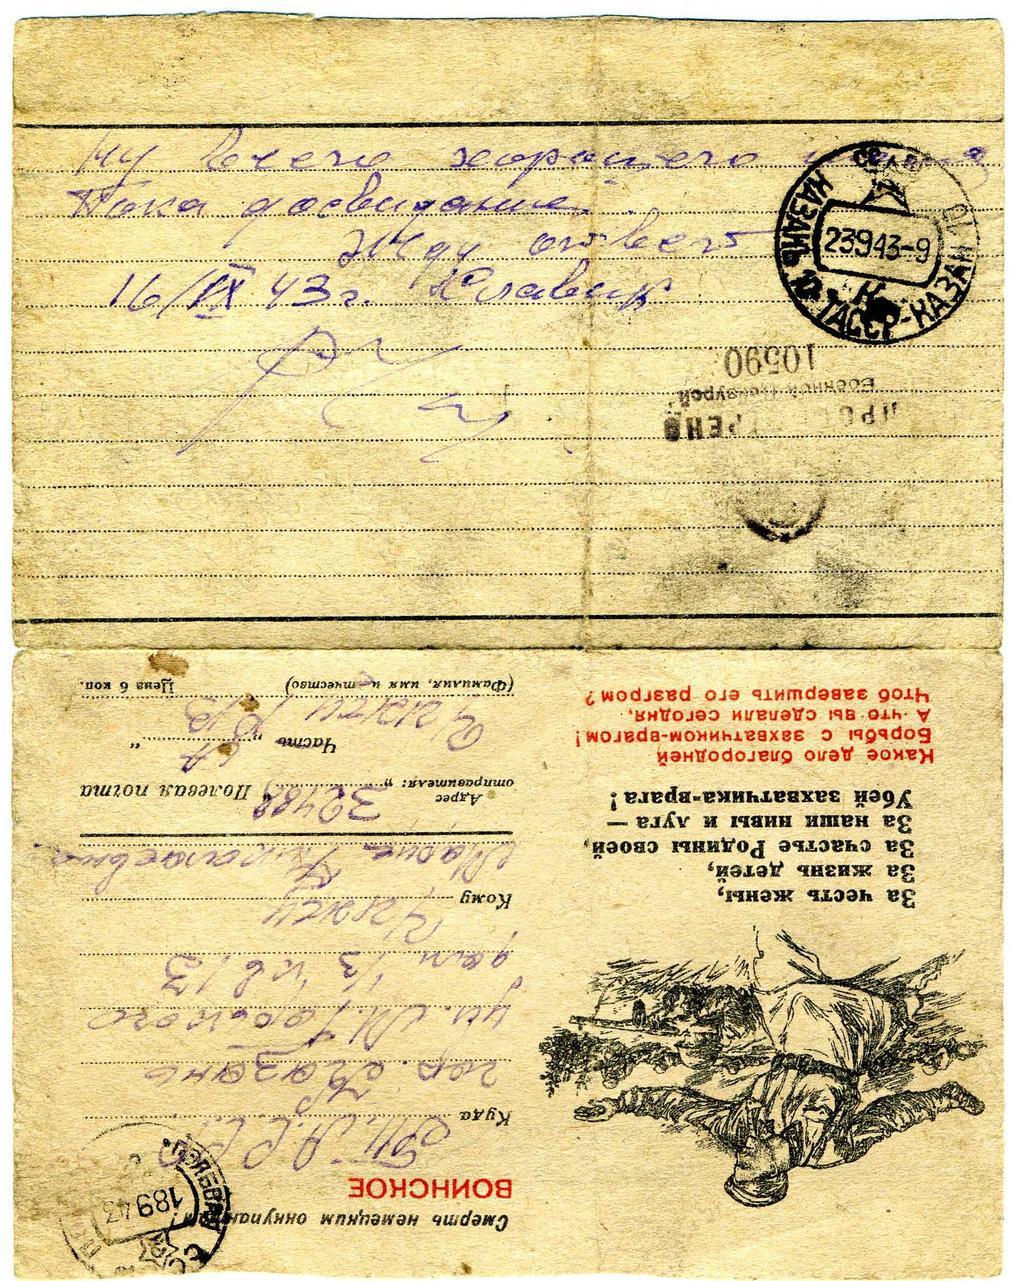 Письмо на бланке Чижу М.Н. сентябрь,1943 ©Tatfrontu.ru Photo Archive